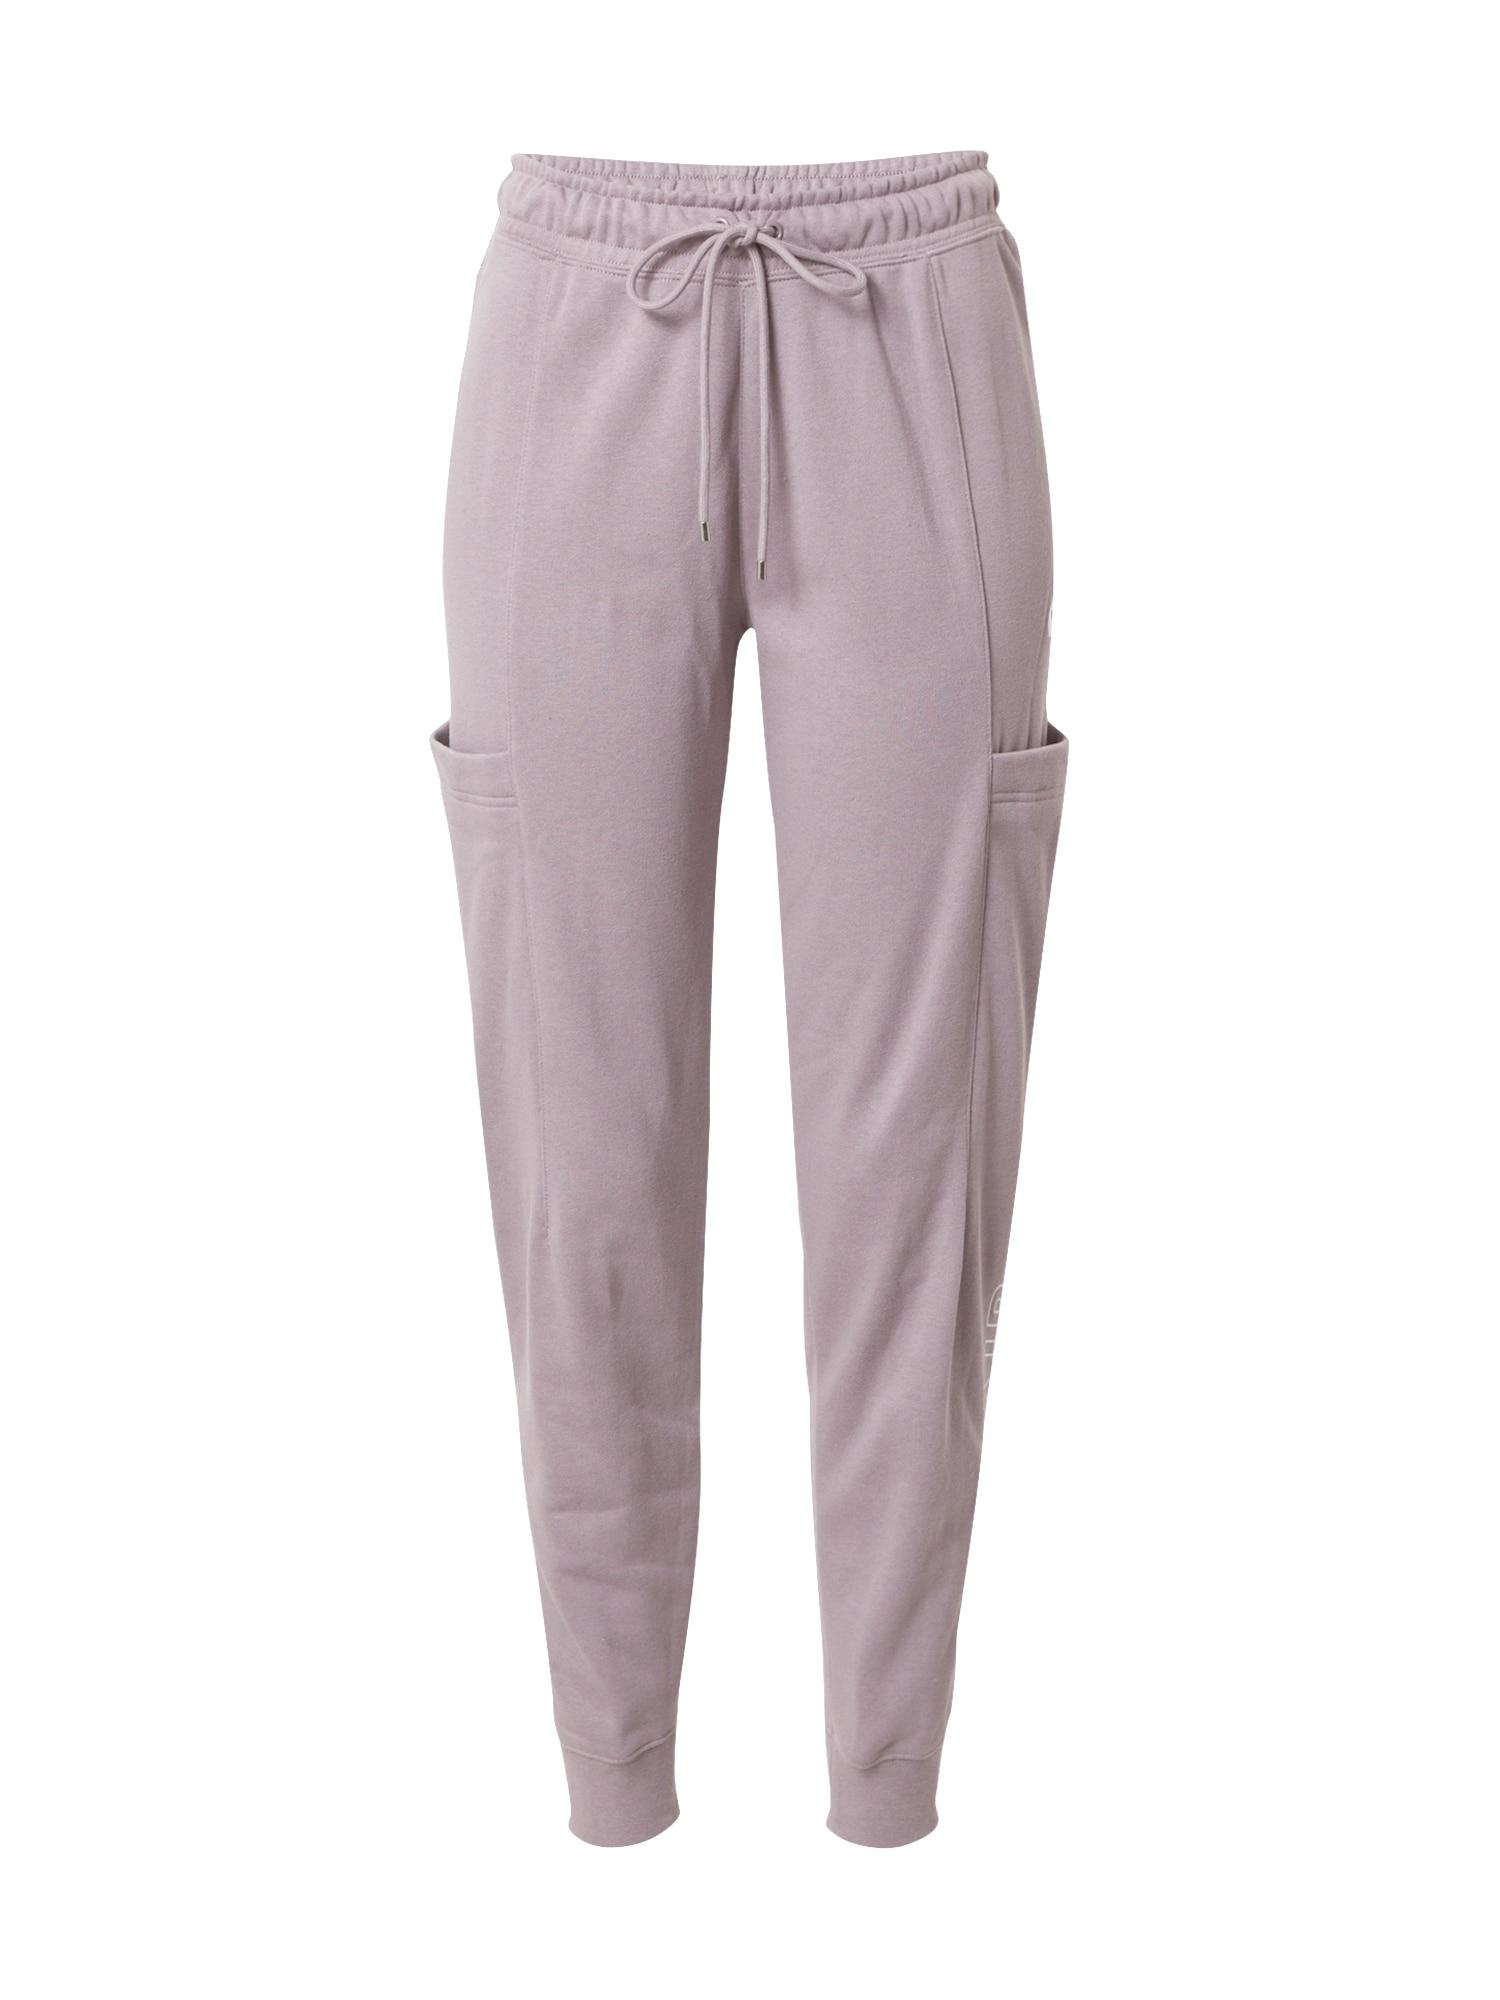 Nike Sportswear Kelnės balta / rausvai pilka